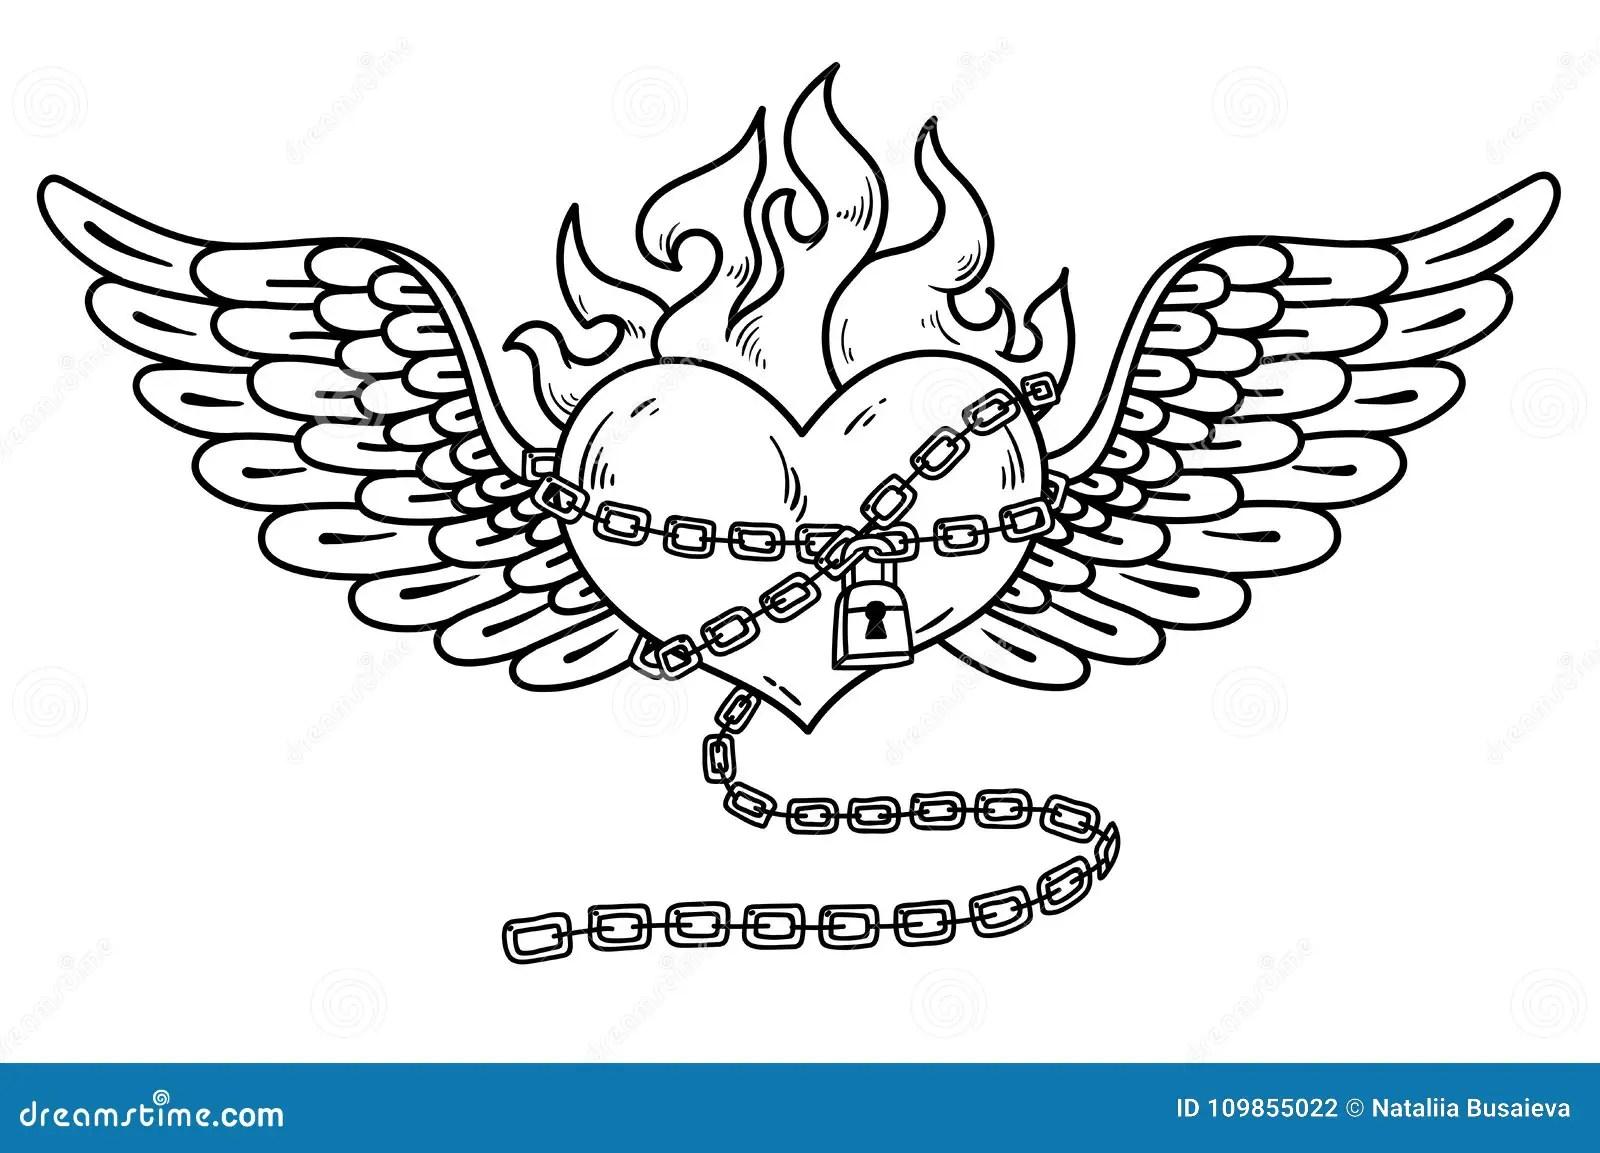 Chain Tattoo Stock Illustrations